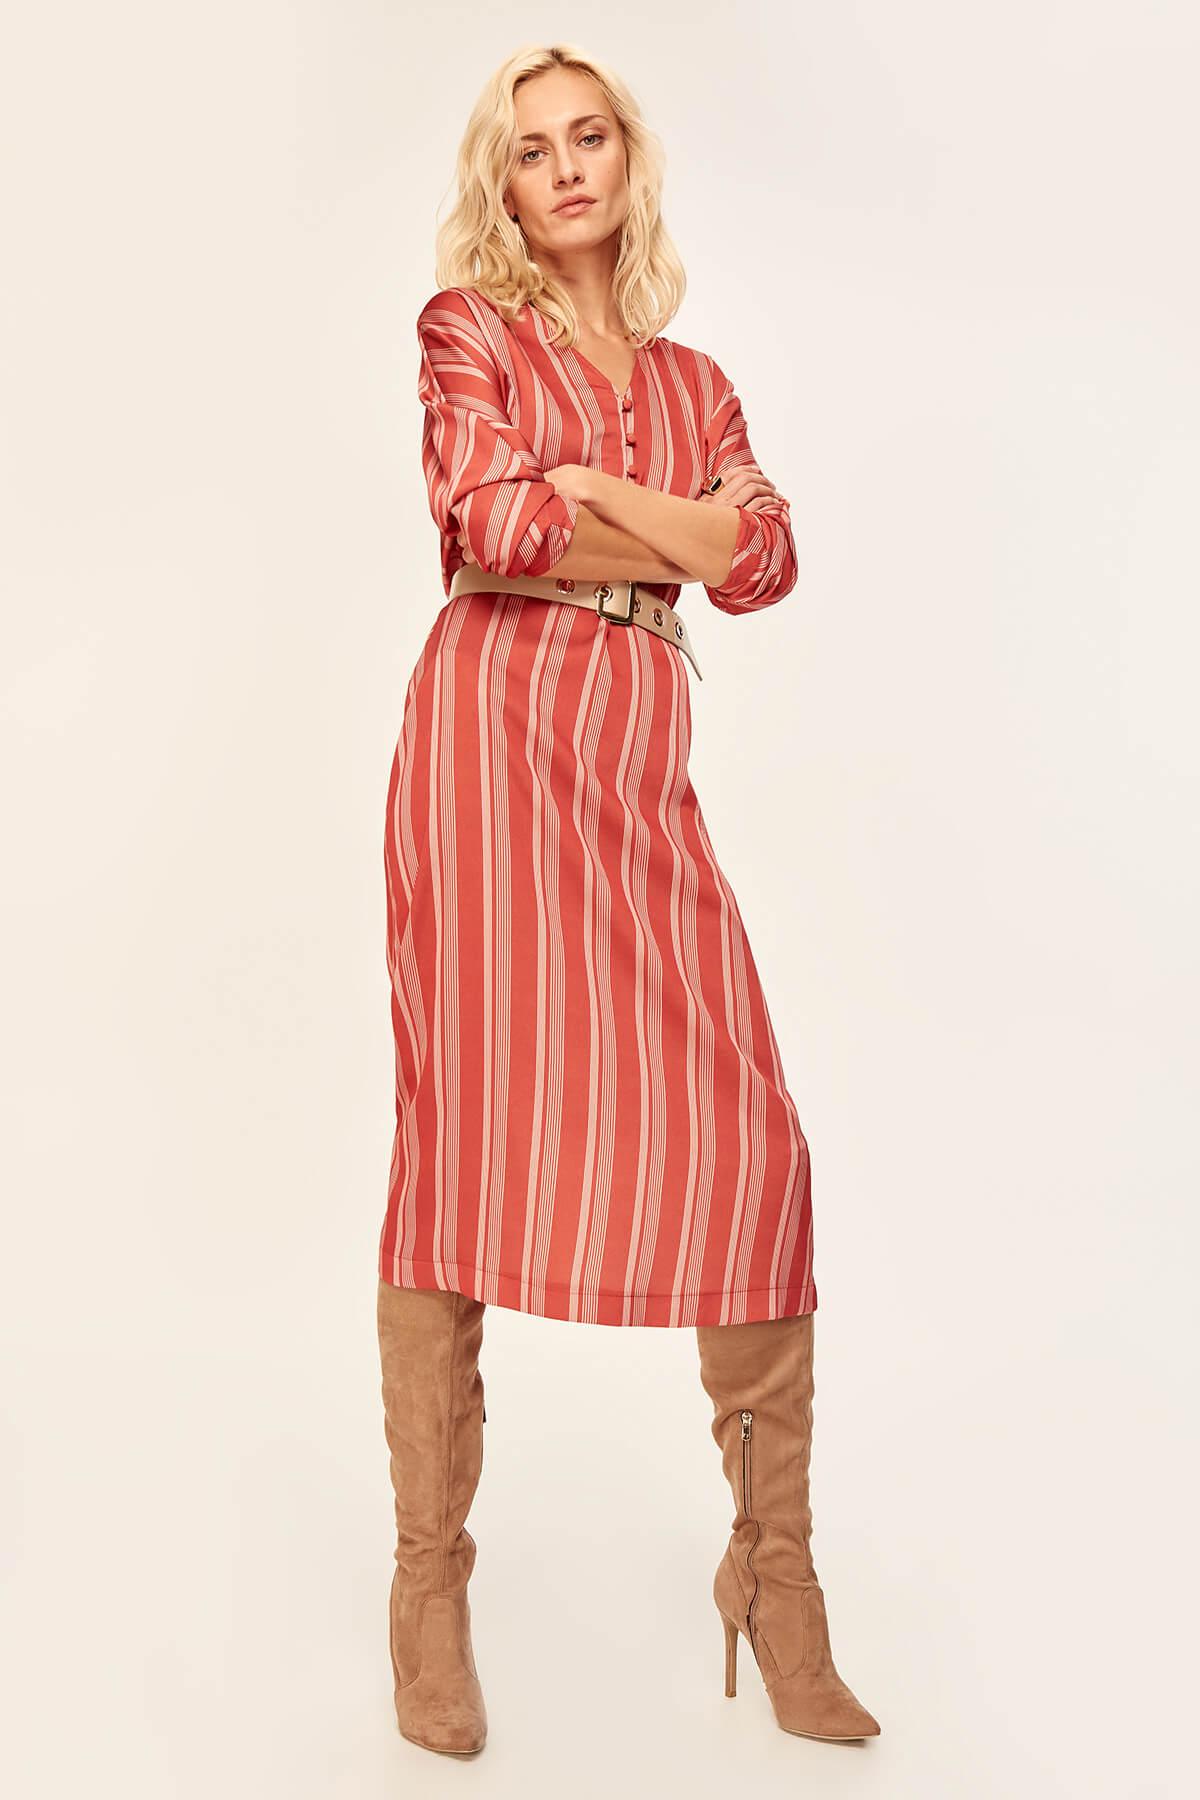 Trendyol Tile Striped Dress TOFAW19LE0042 2